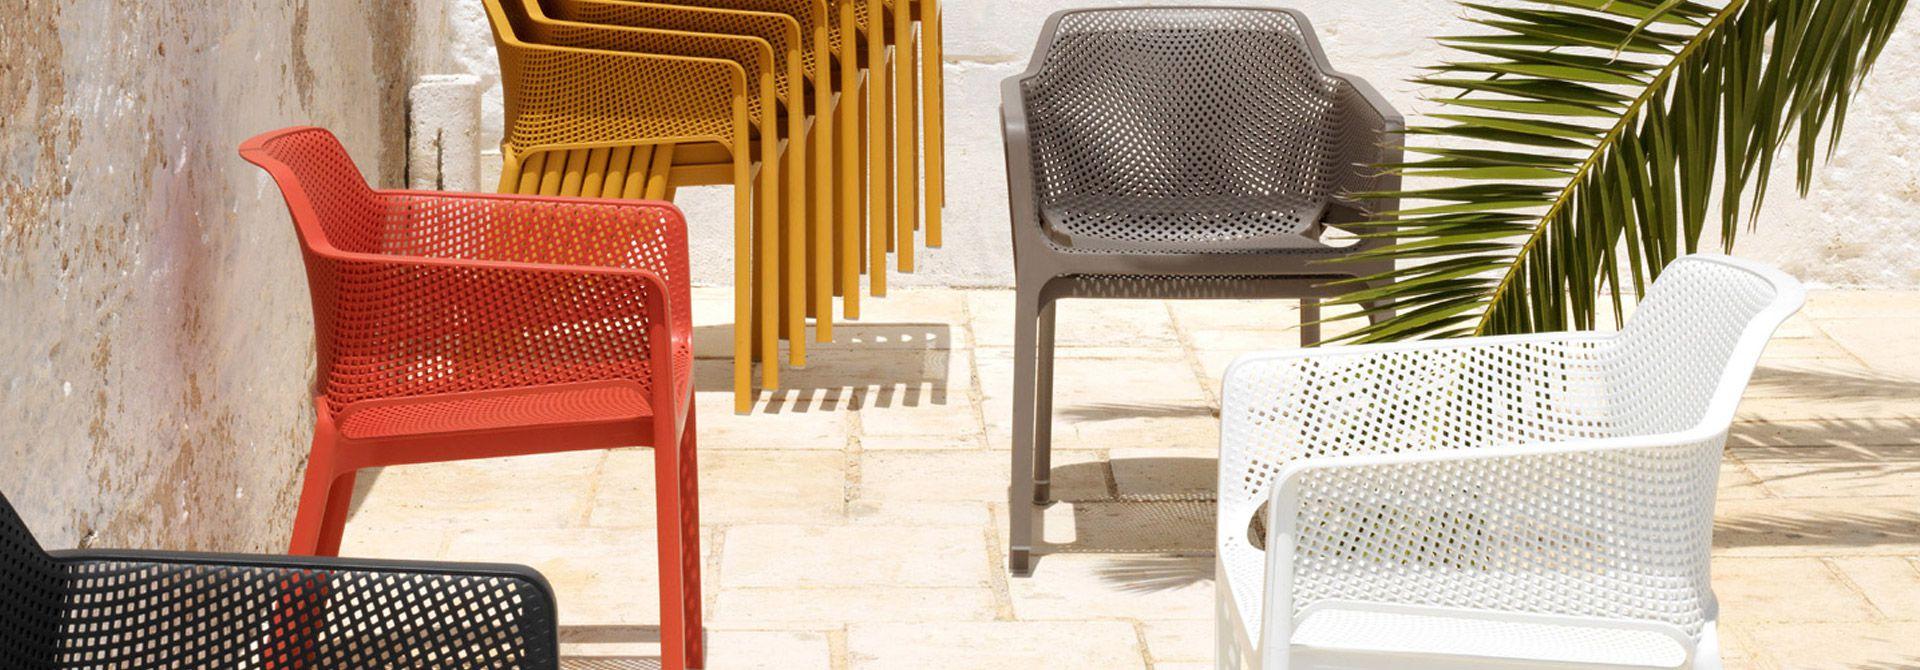 Mar Sedie E Tavoli.Duedi Tavoli E Sedie Vendita E Produzione Tavoli Sedie Sedute